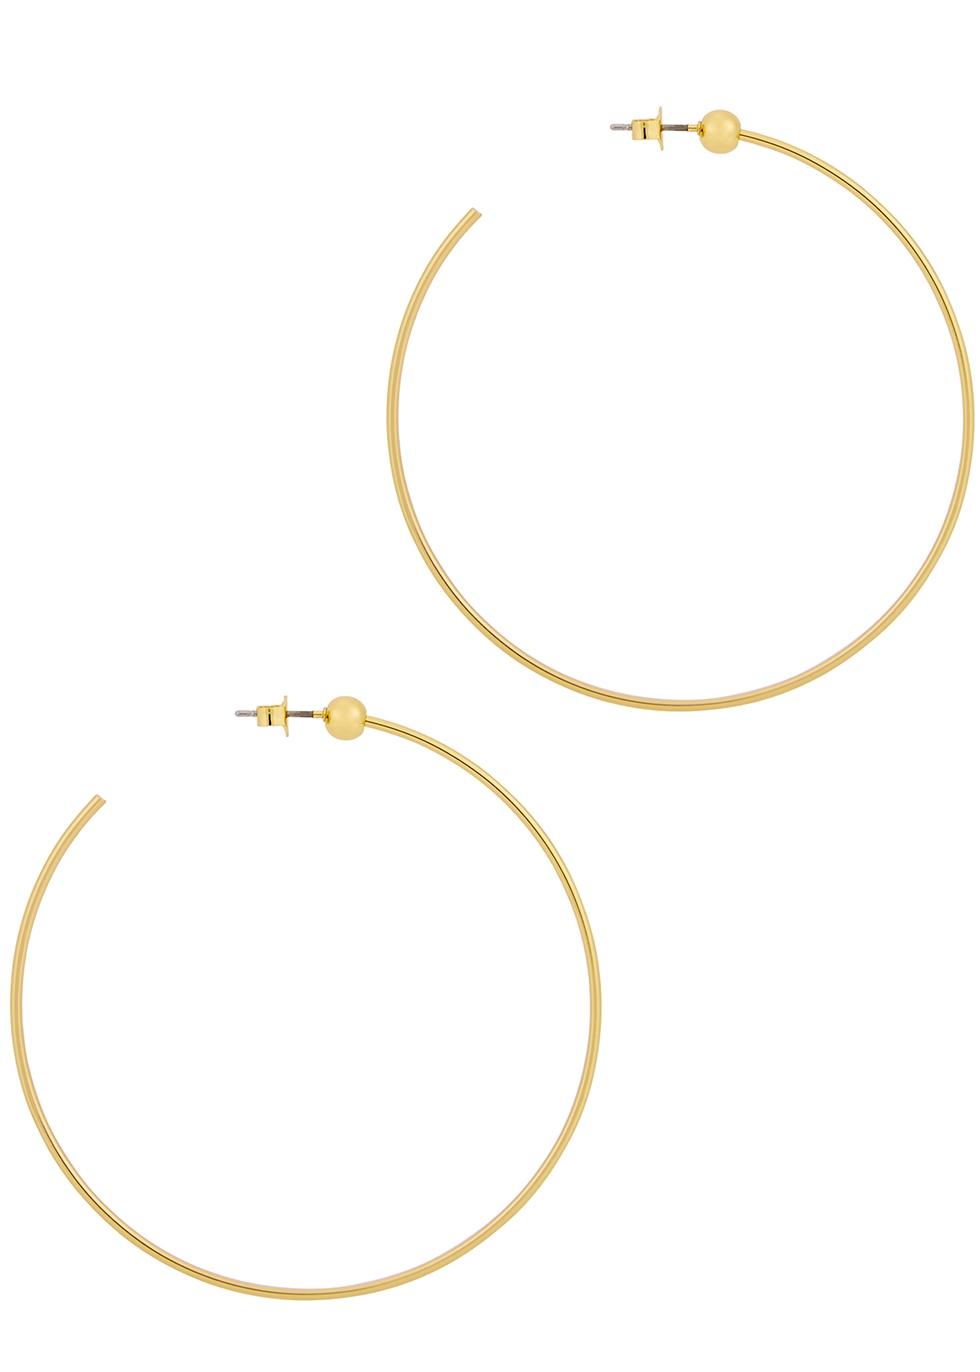 Icon medium 14kt gold-dipped earrings - JENNY BIRD